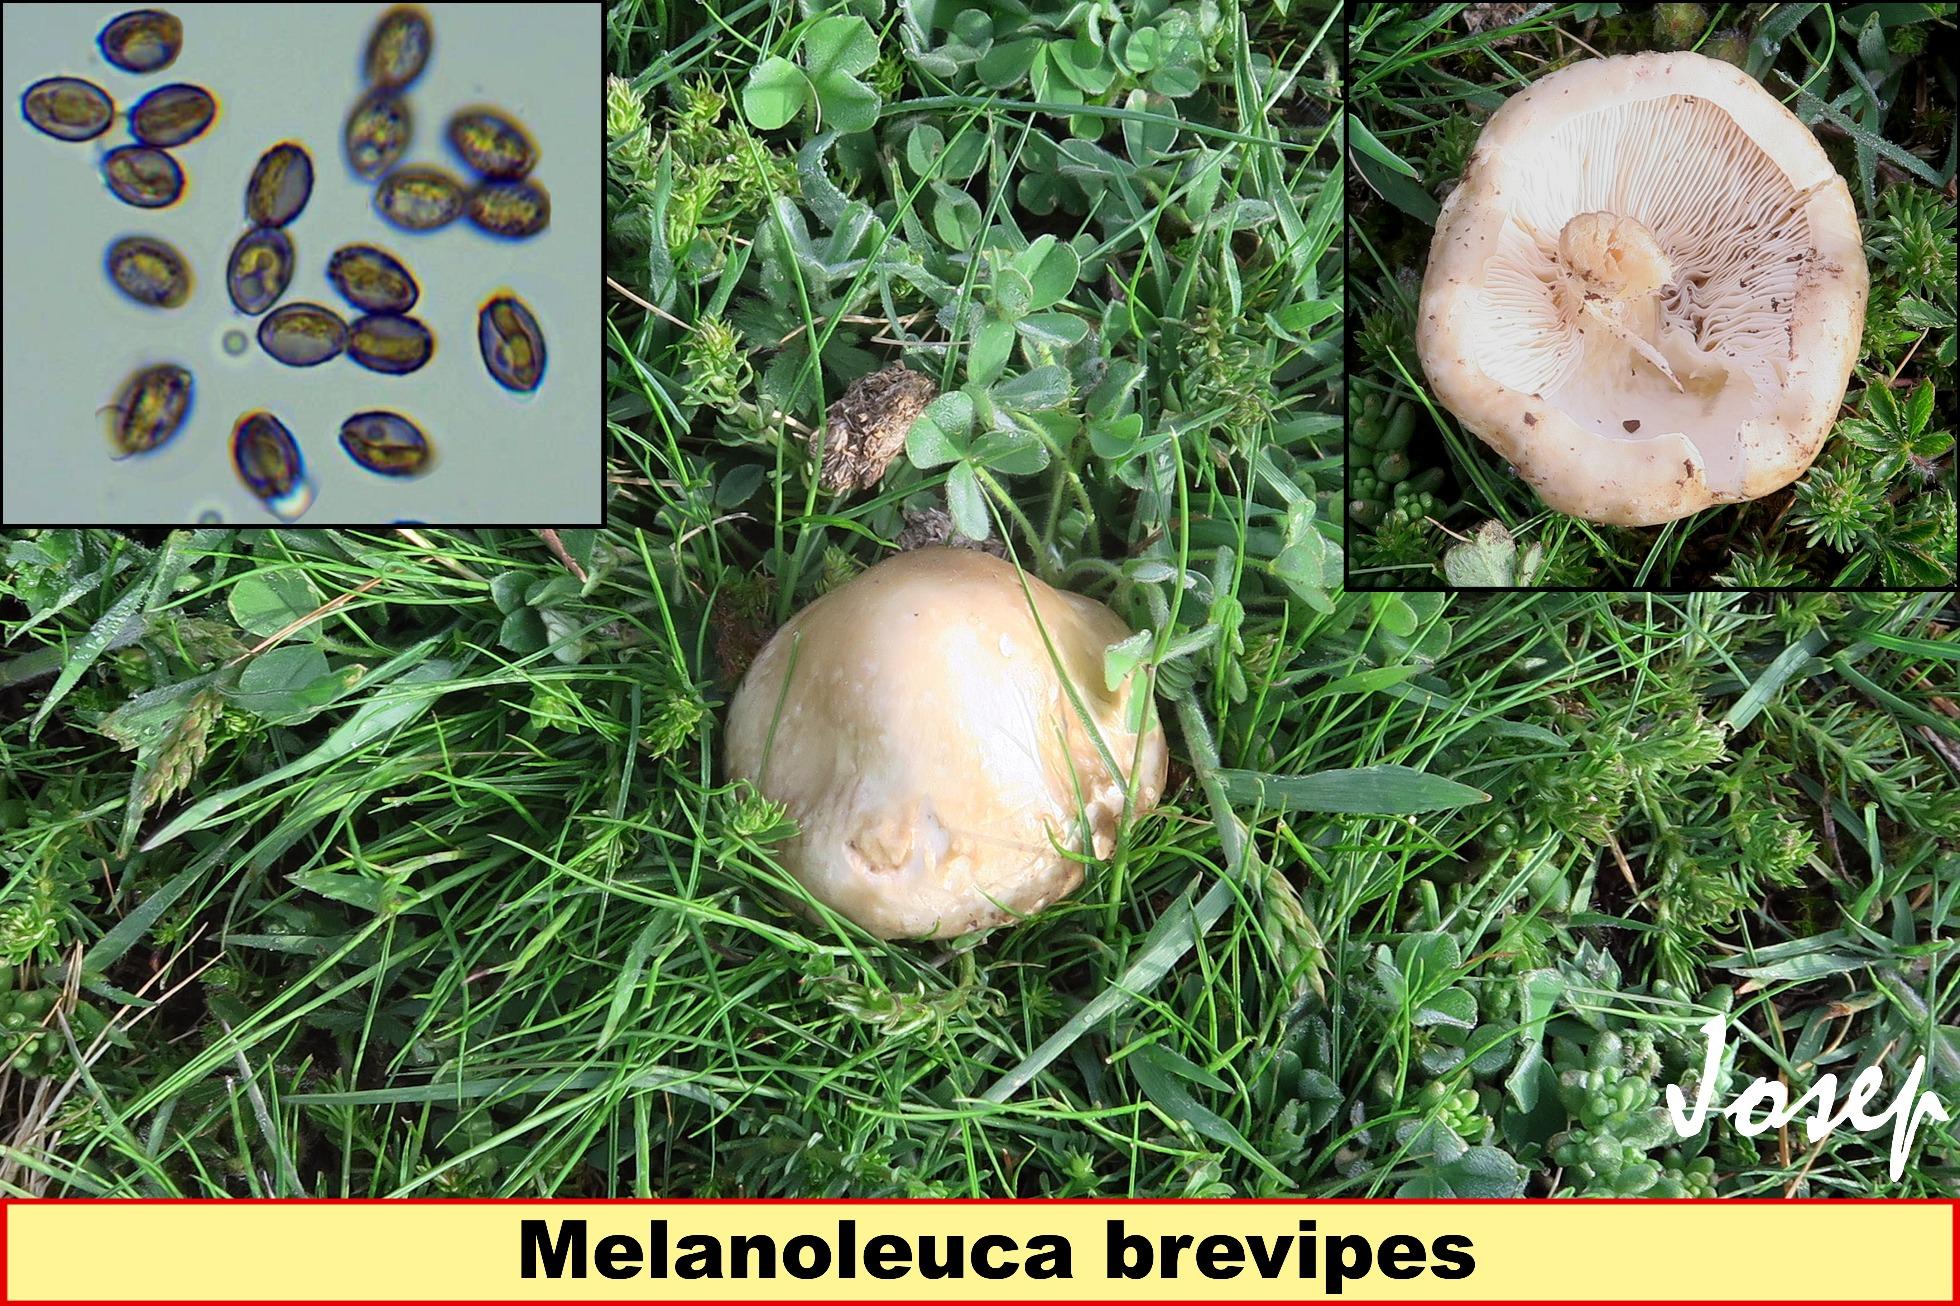 Melanoleucabrevipes_2018-04-16.jpg